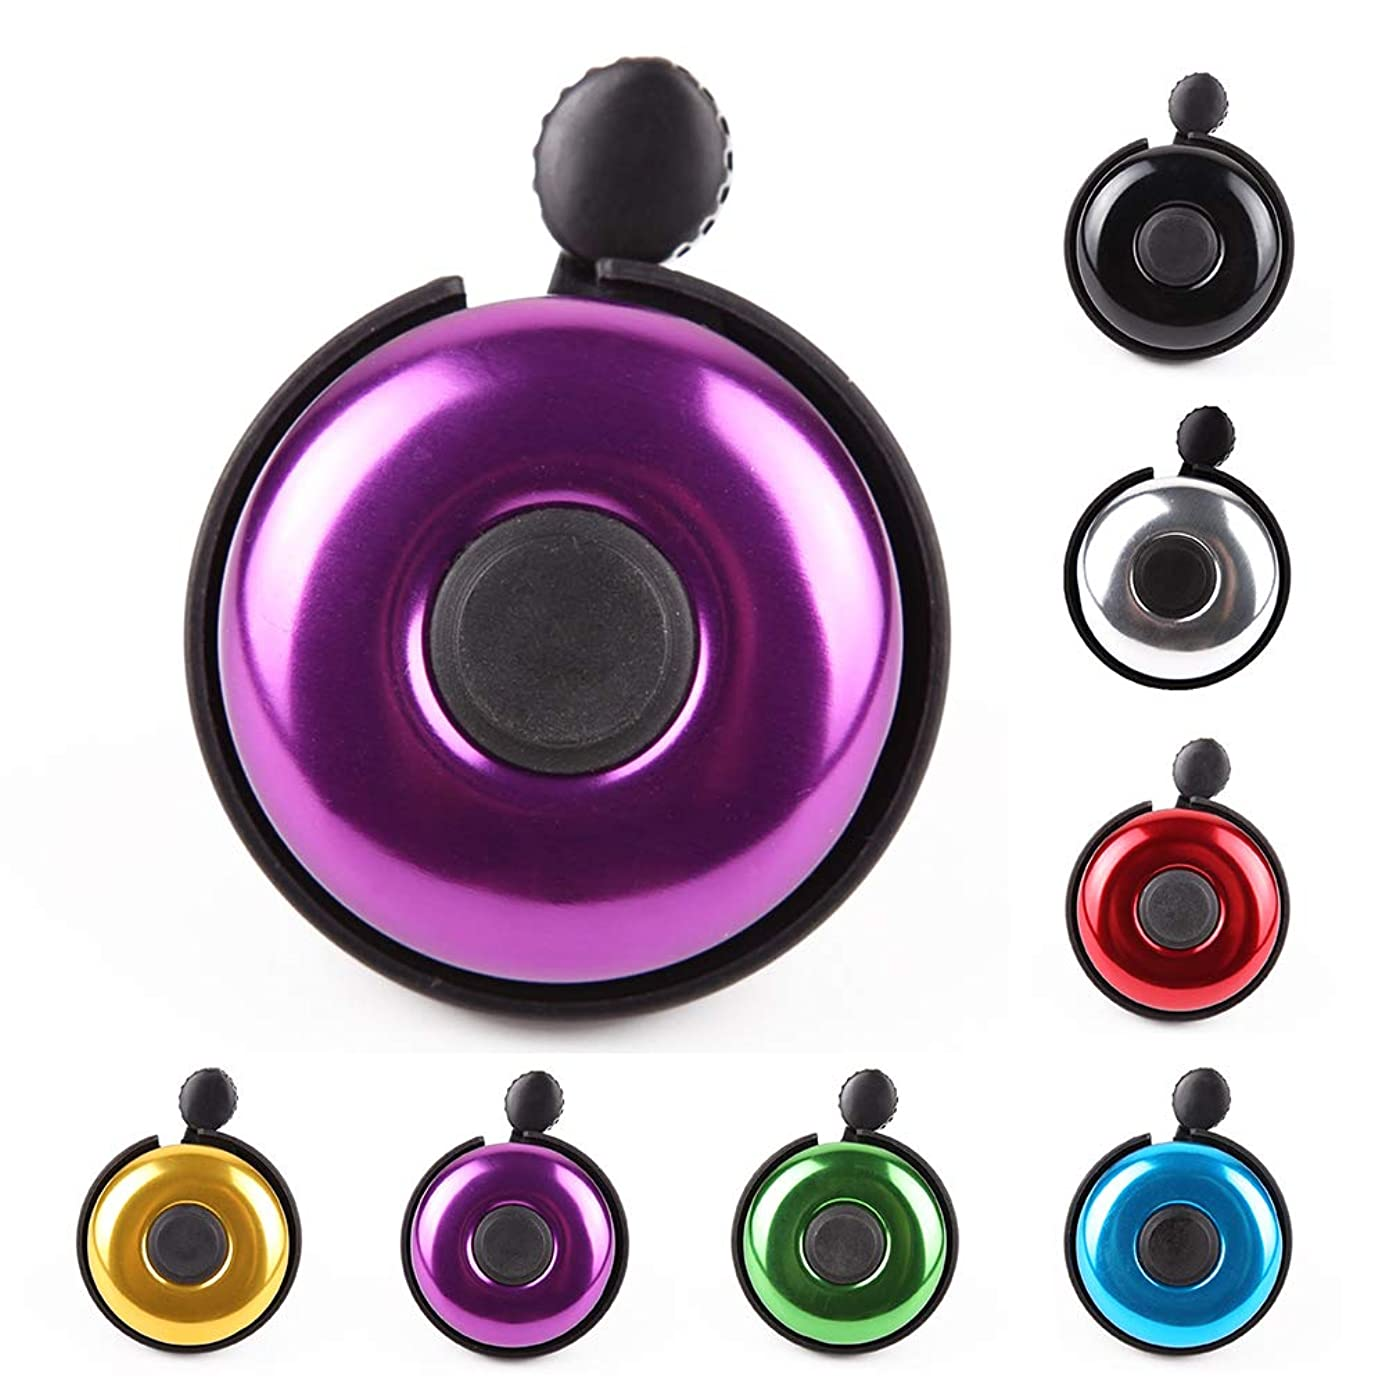 MOFAST Bike Bell for Adult Kids Girls Boys (2 Styles, 7 Colors)